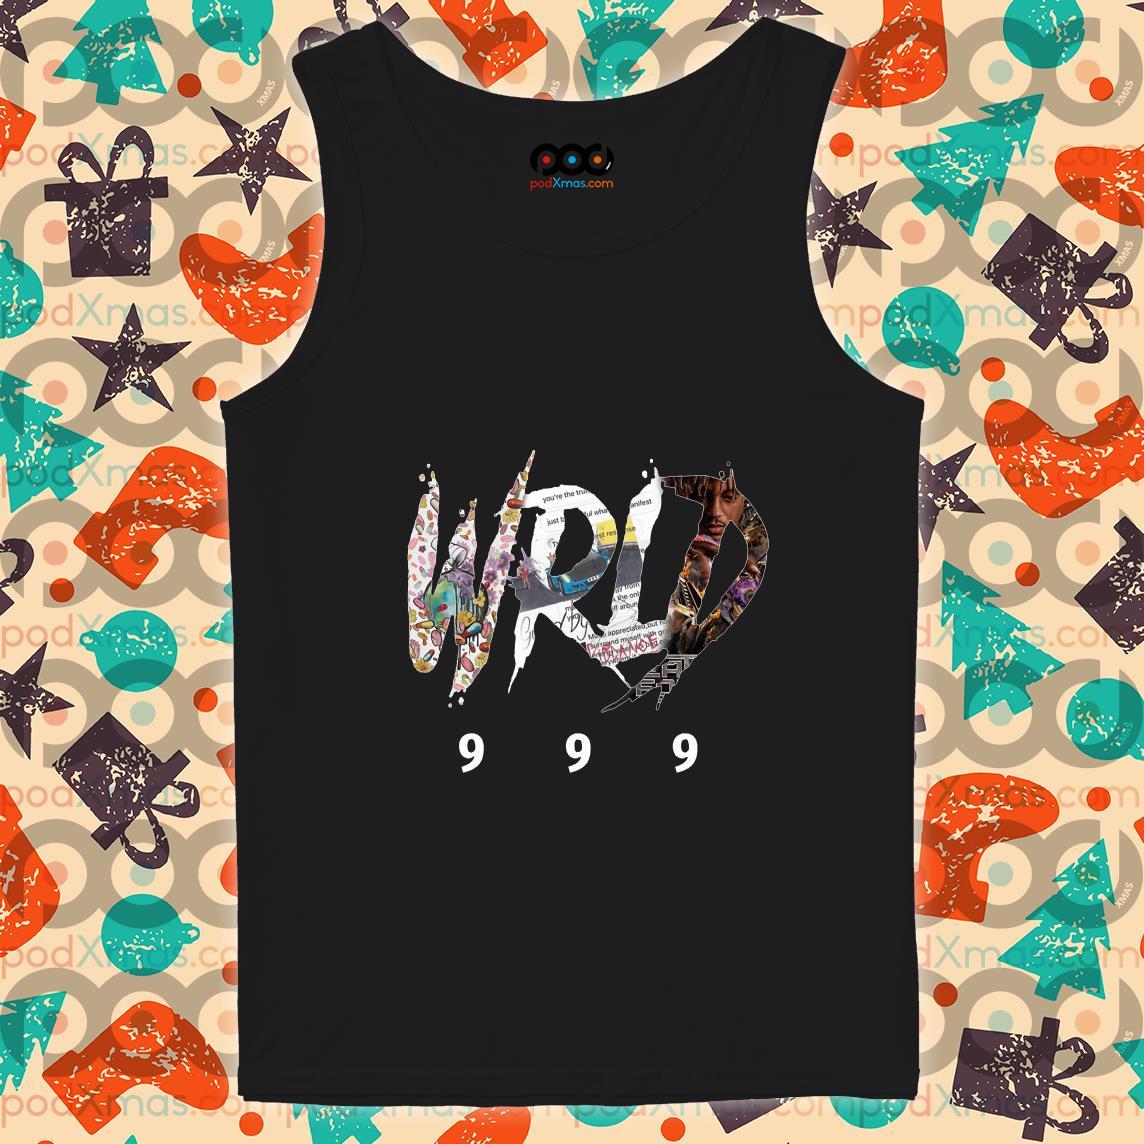 RIP Juice WRLD 999 tank top